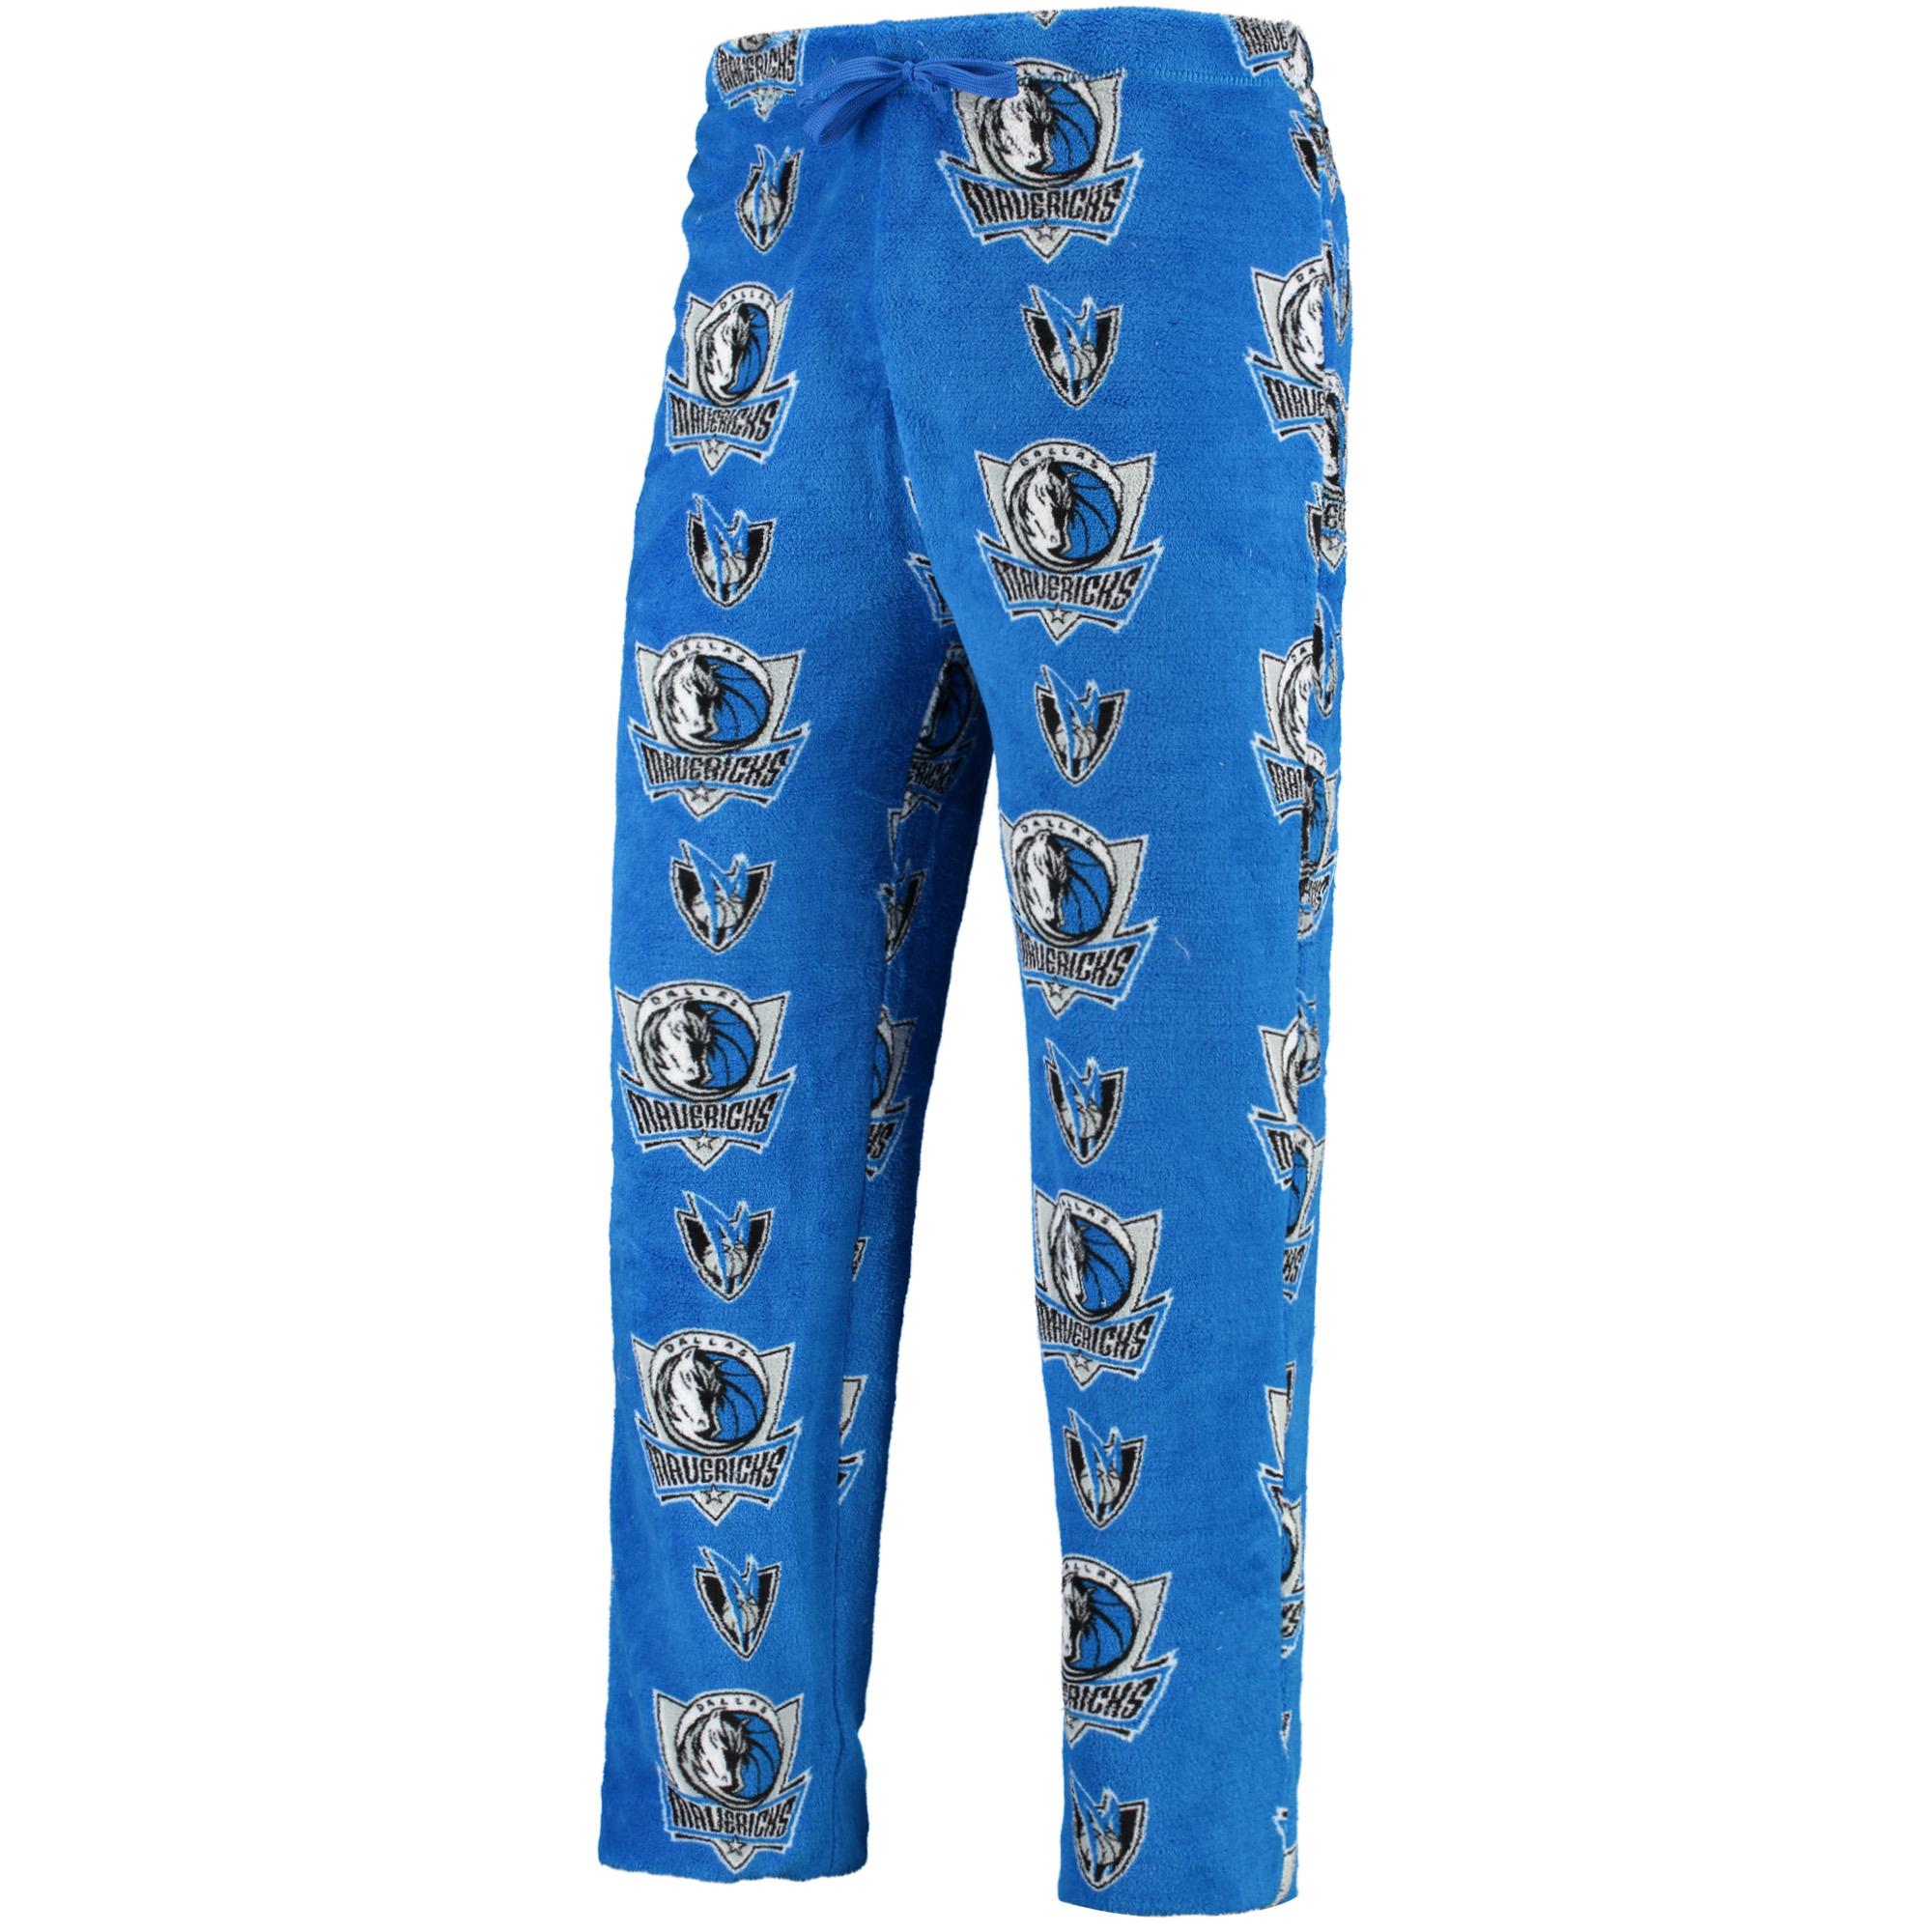 Dallas Mavericks UNK Plush Team Lounge Pants - Blue